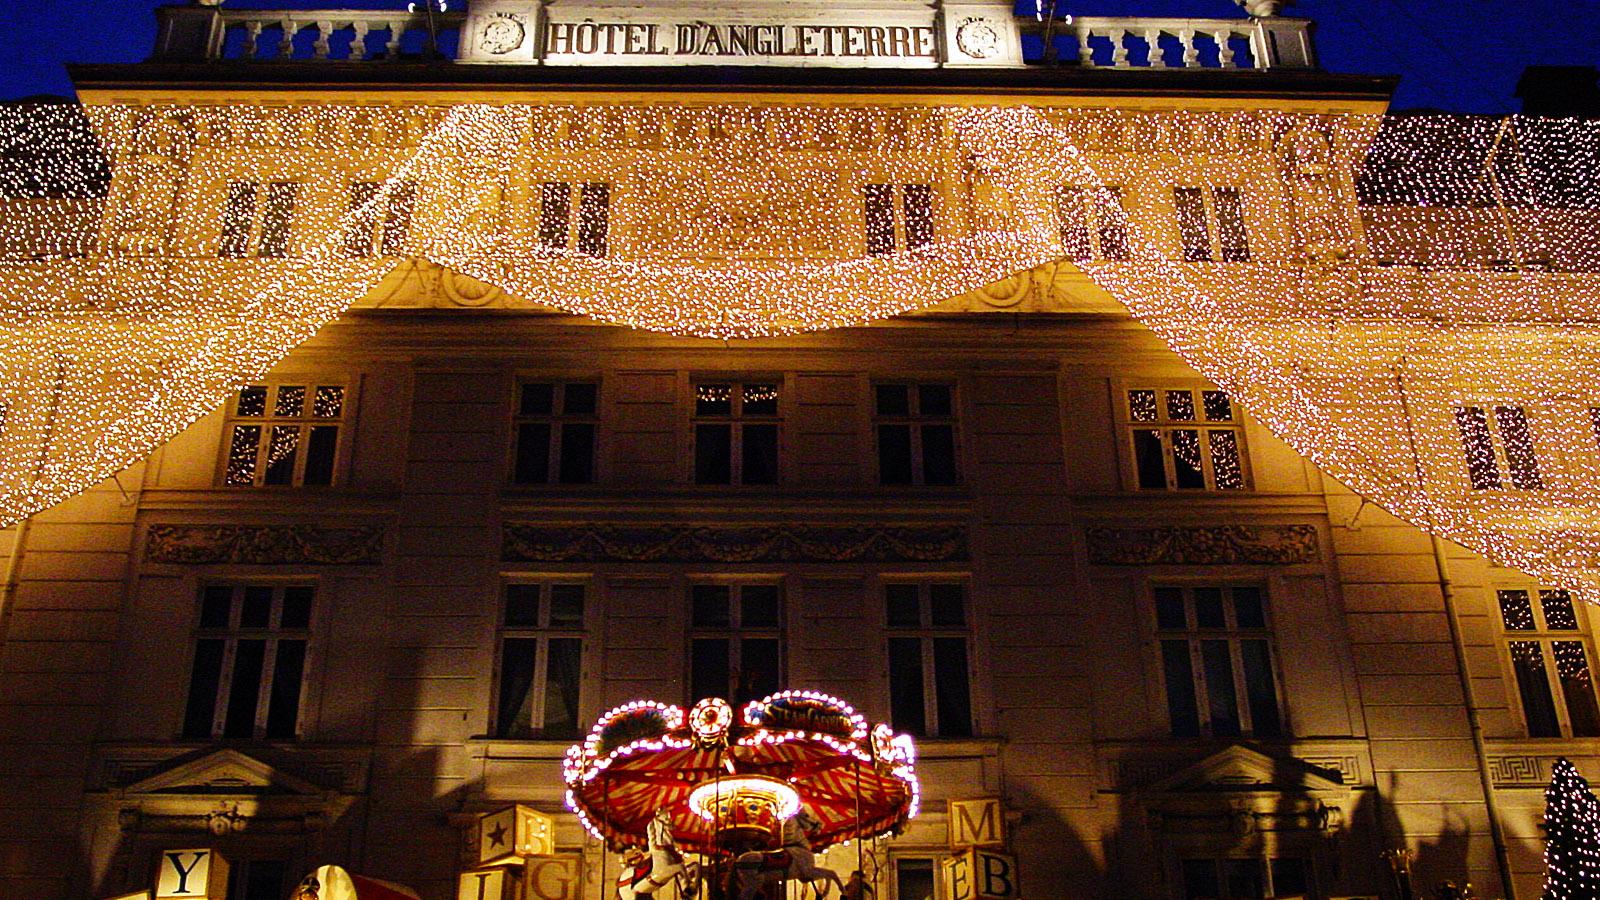 Juletid: Das Hotel Angleterre am Kongens Nytorv. Foto: Hilke Maunder